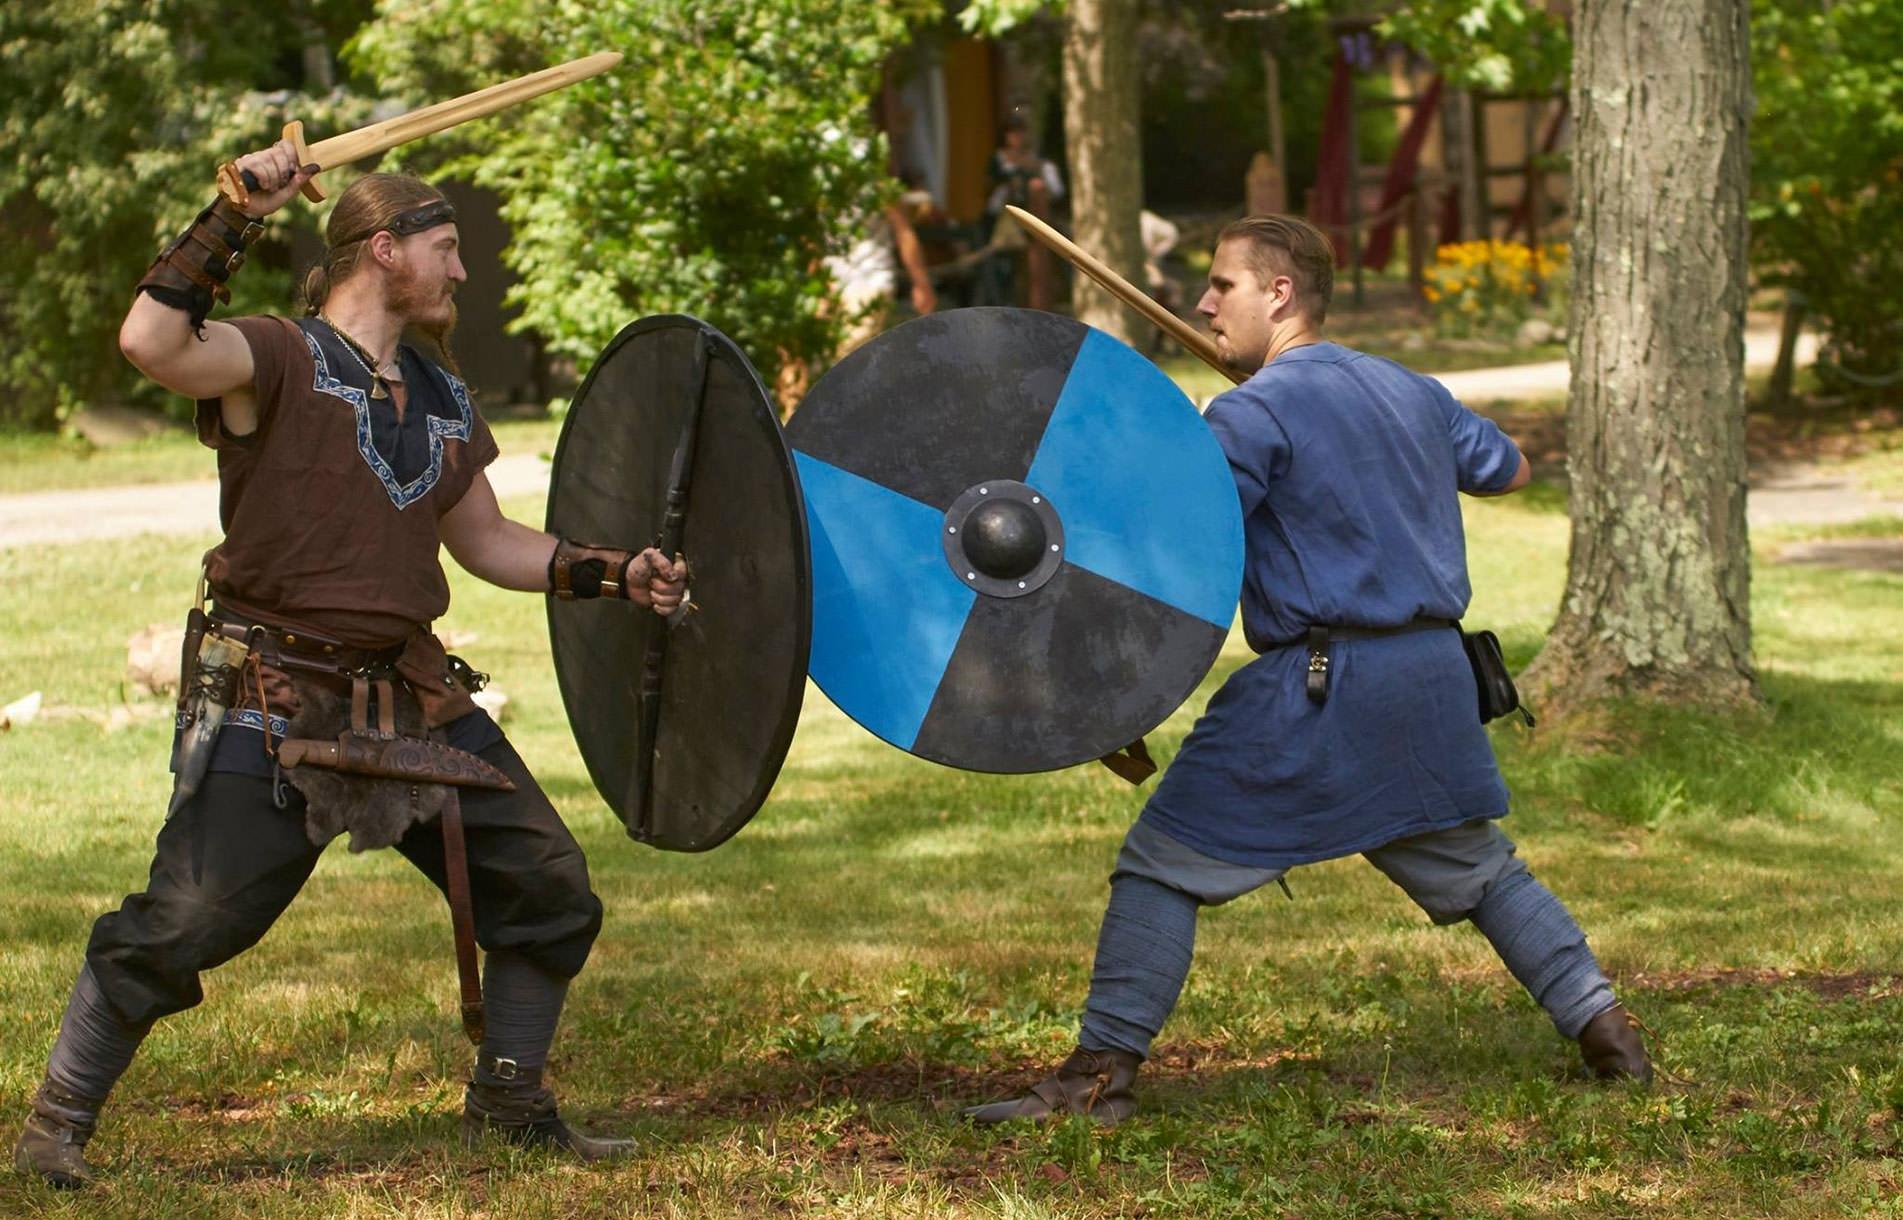 Wooden Practice & Medieval Swords | Shields | Crossbows